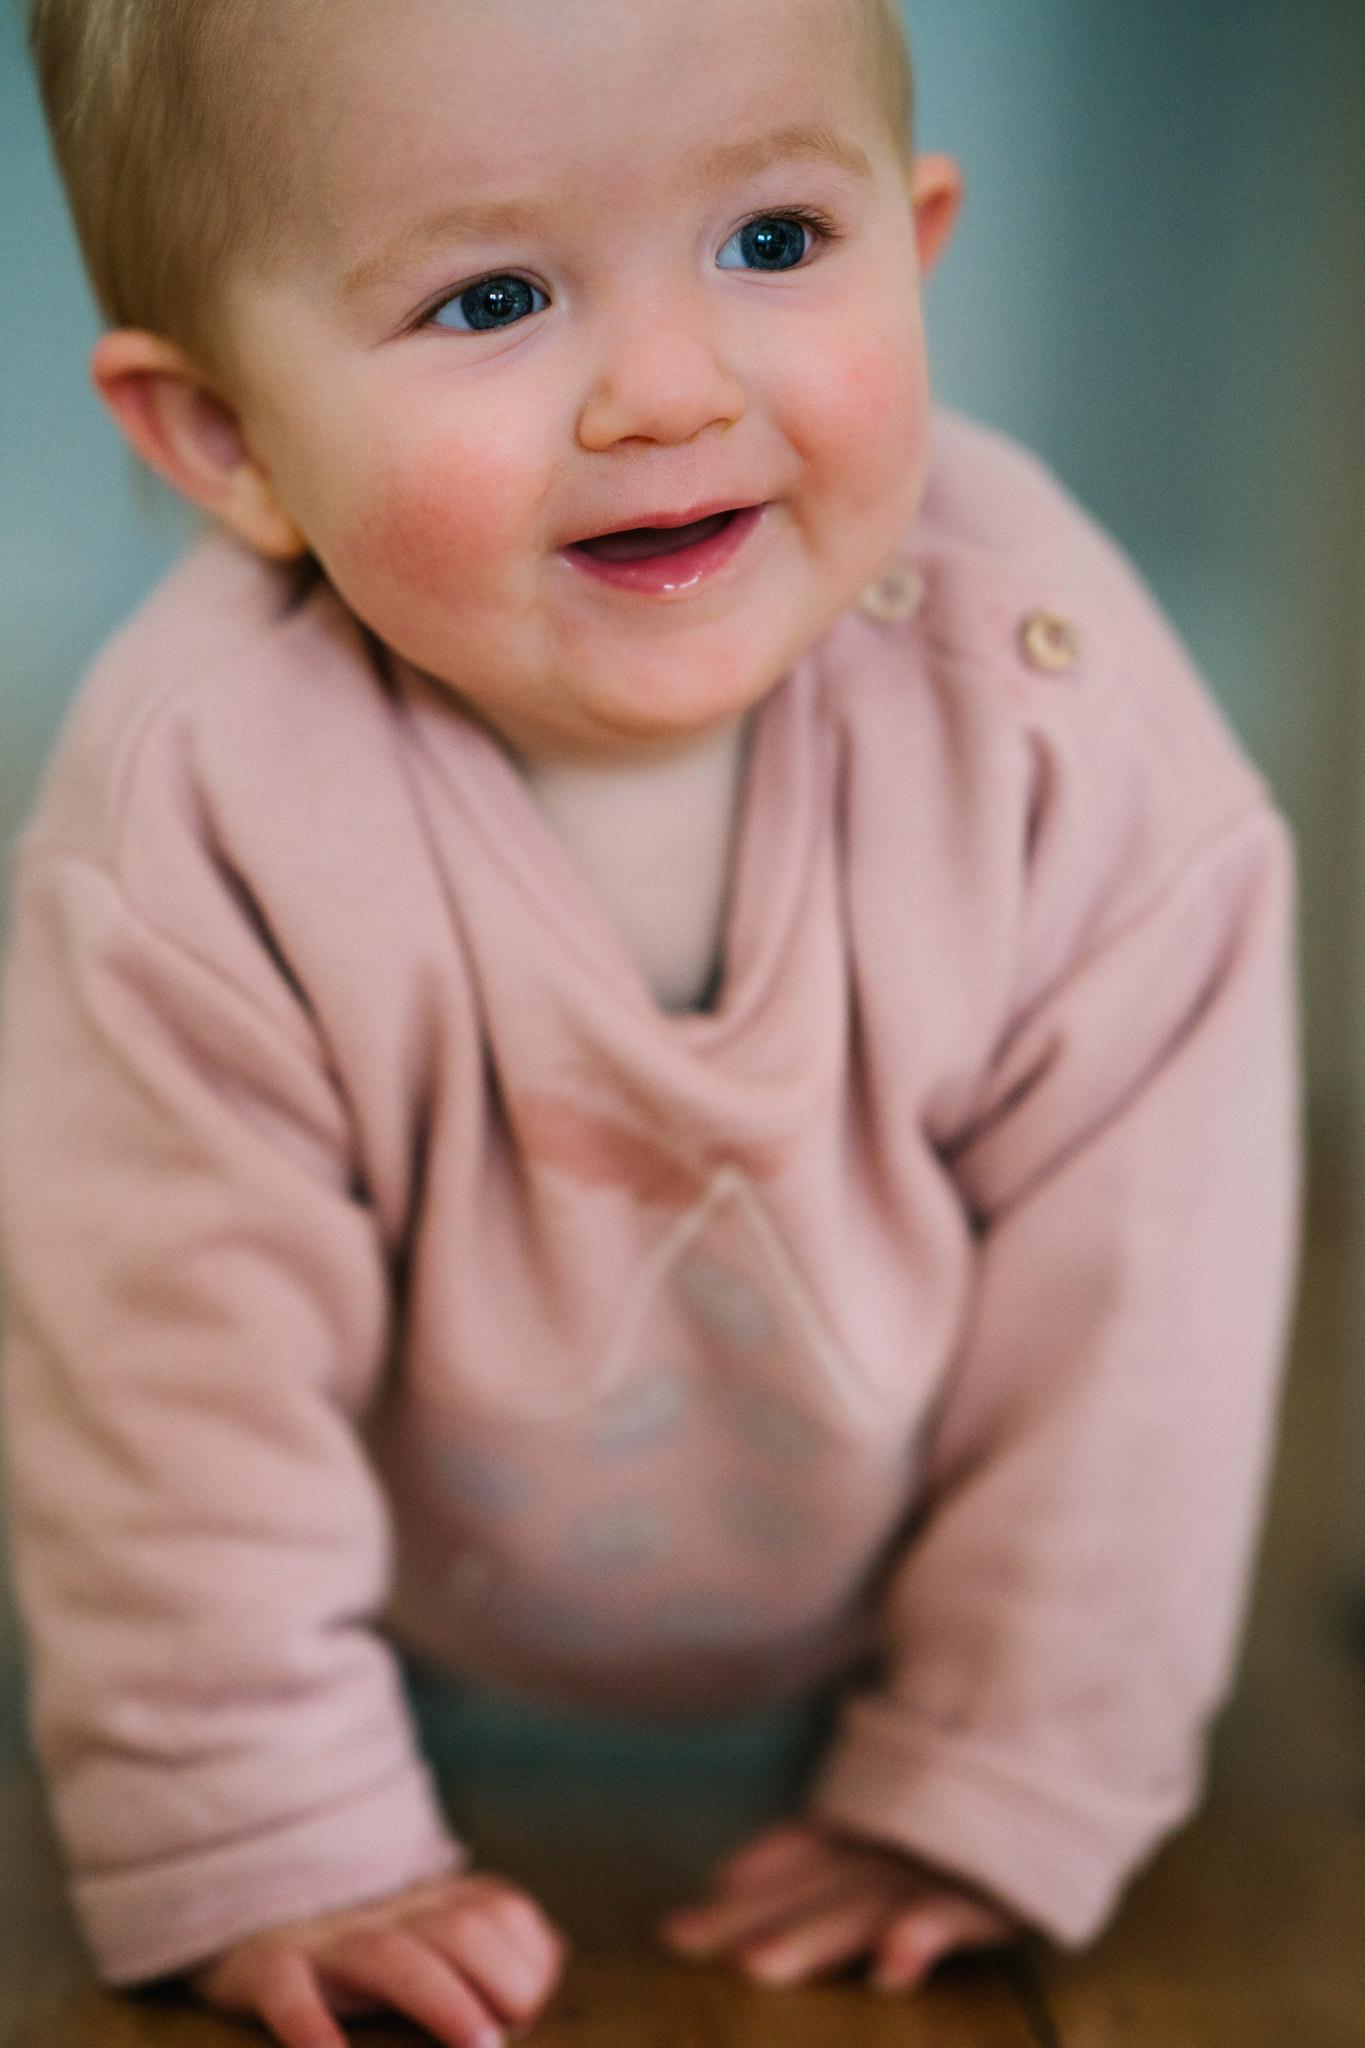 Baby smiling as she crawls towards camera